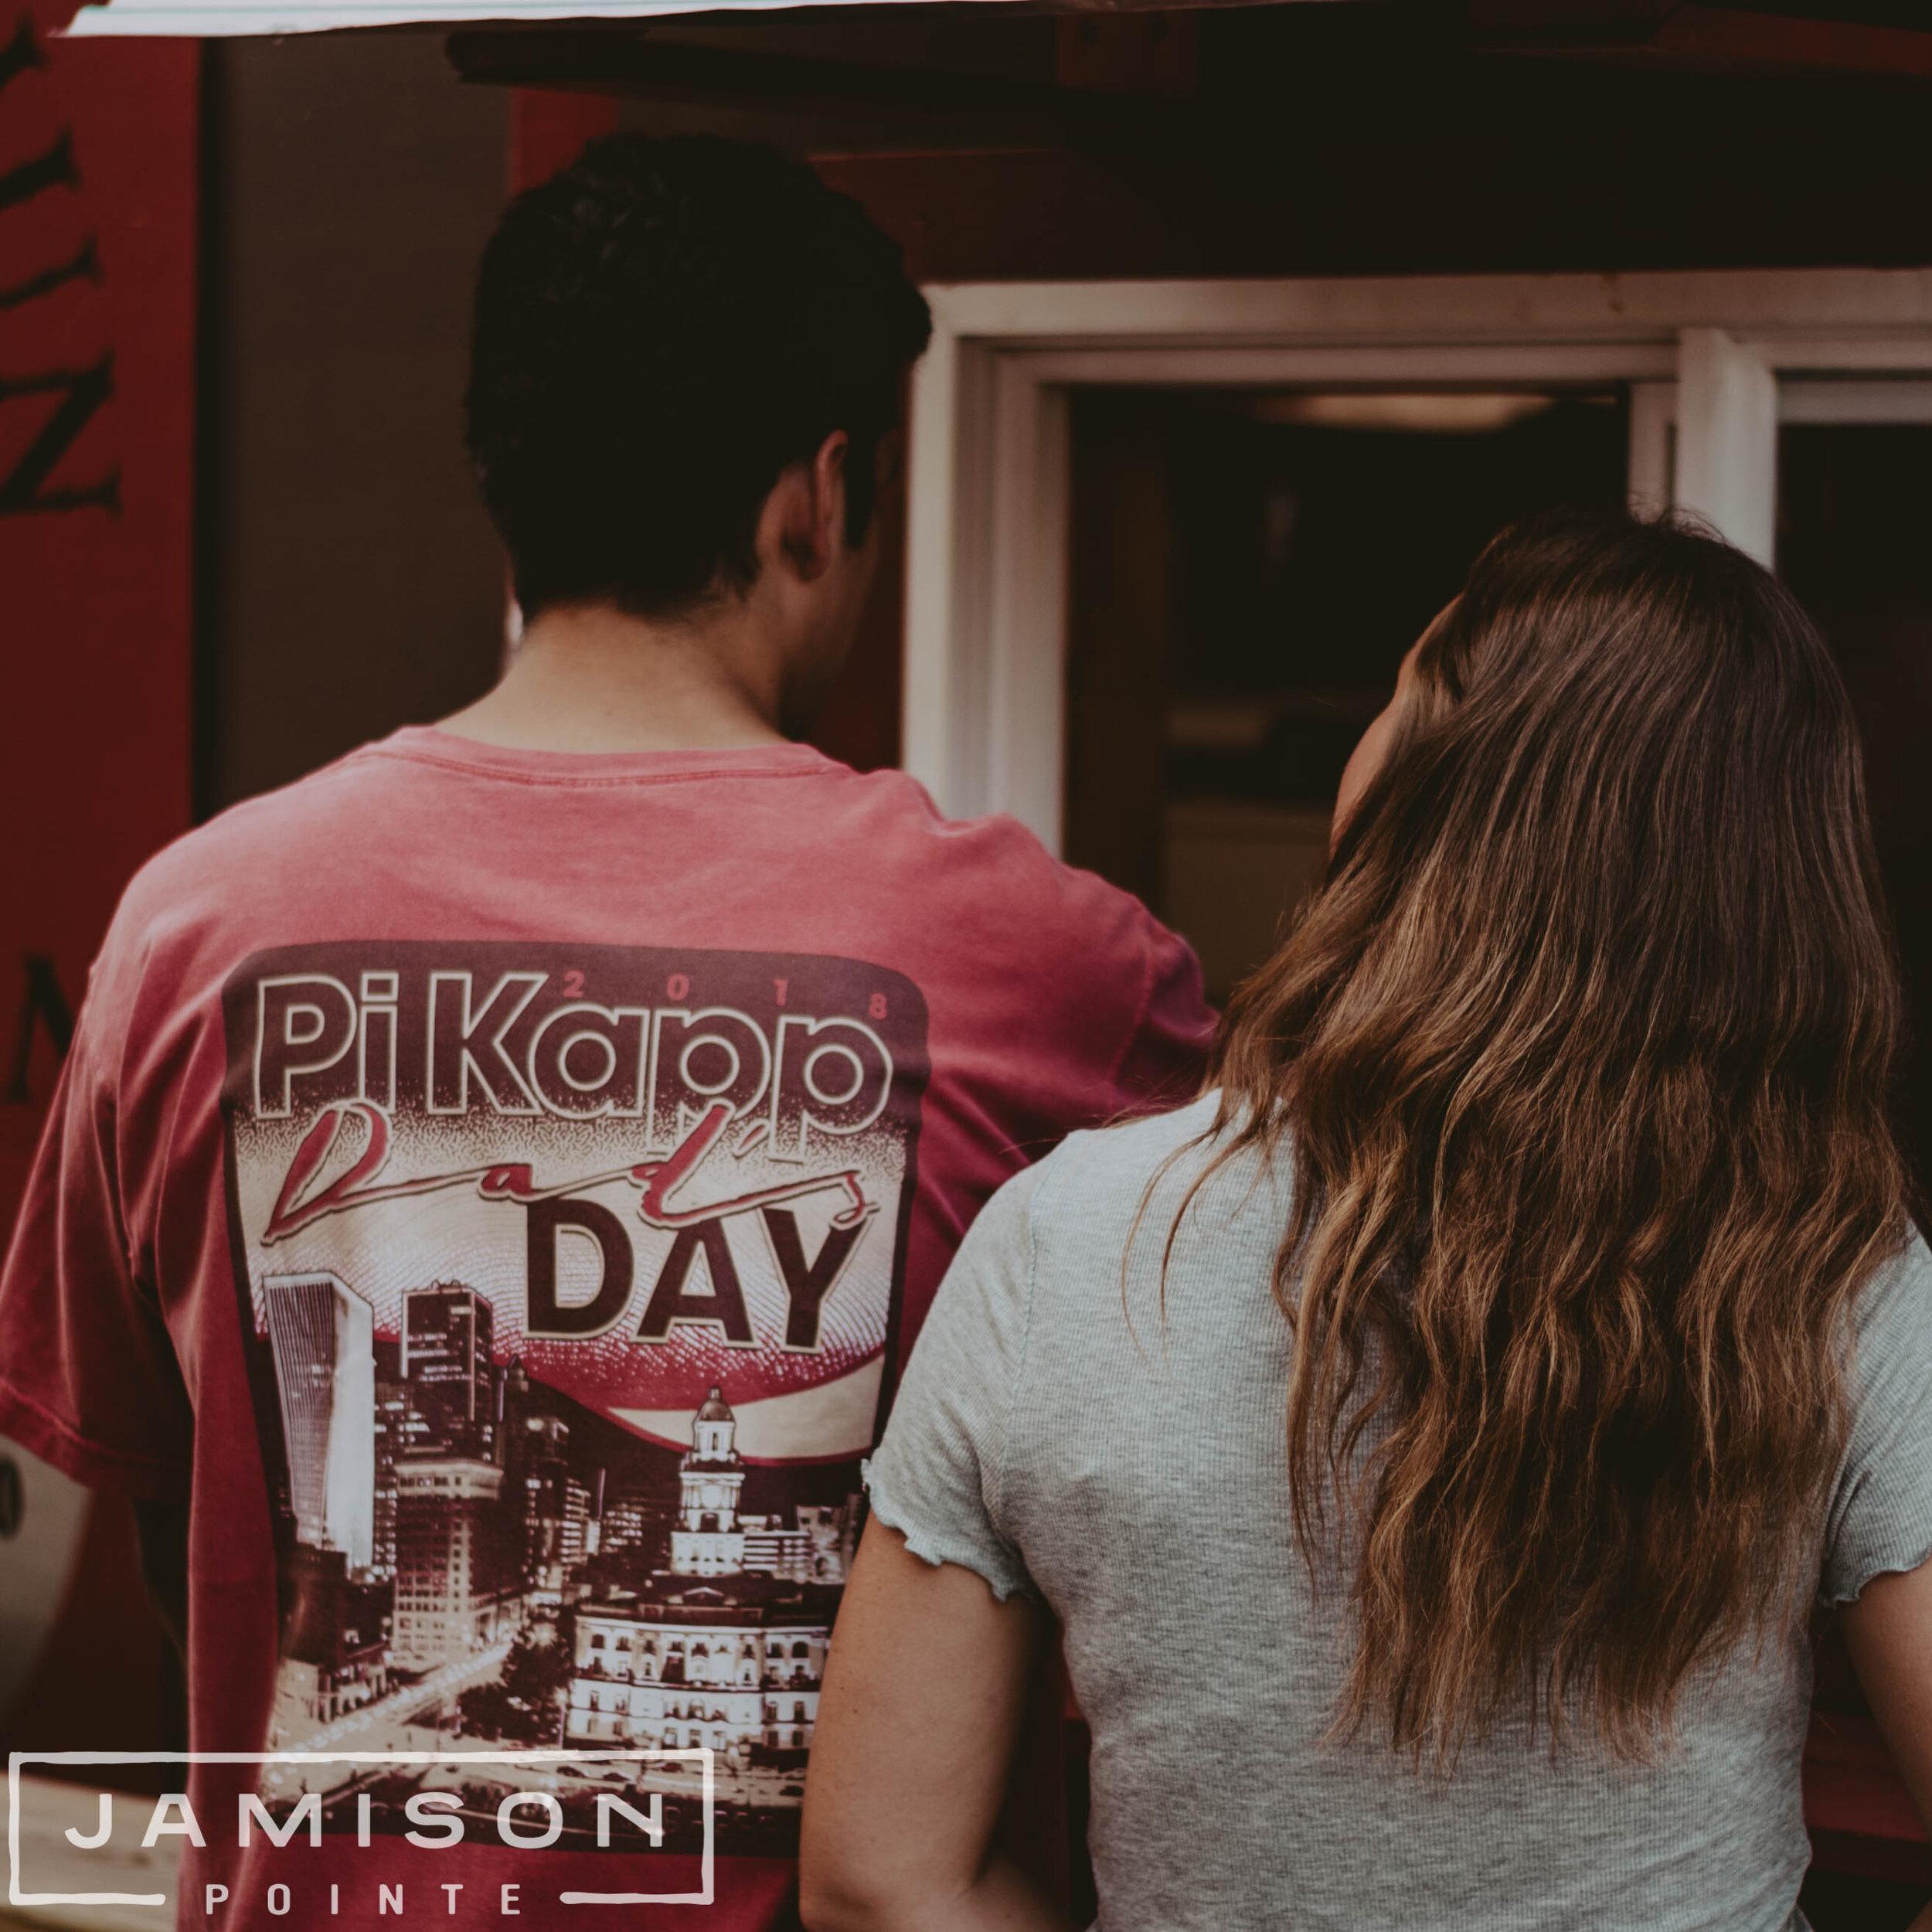 Pi Kappa Phi Dads Day Tshirt